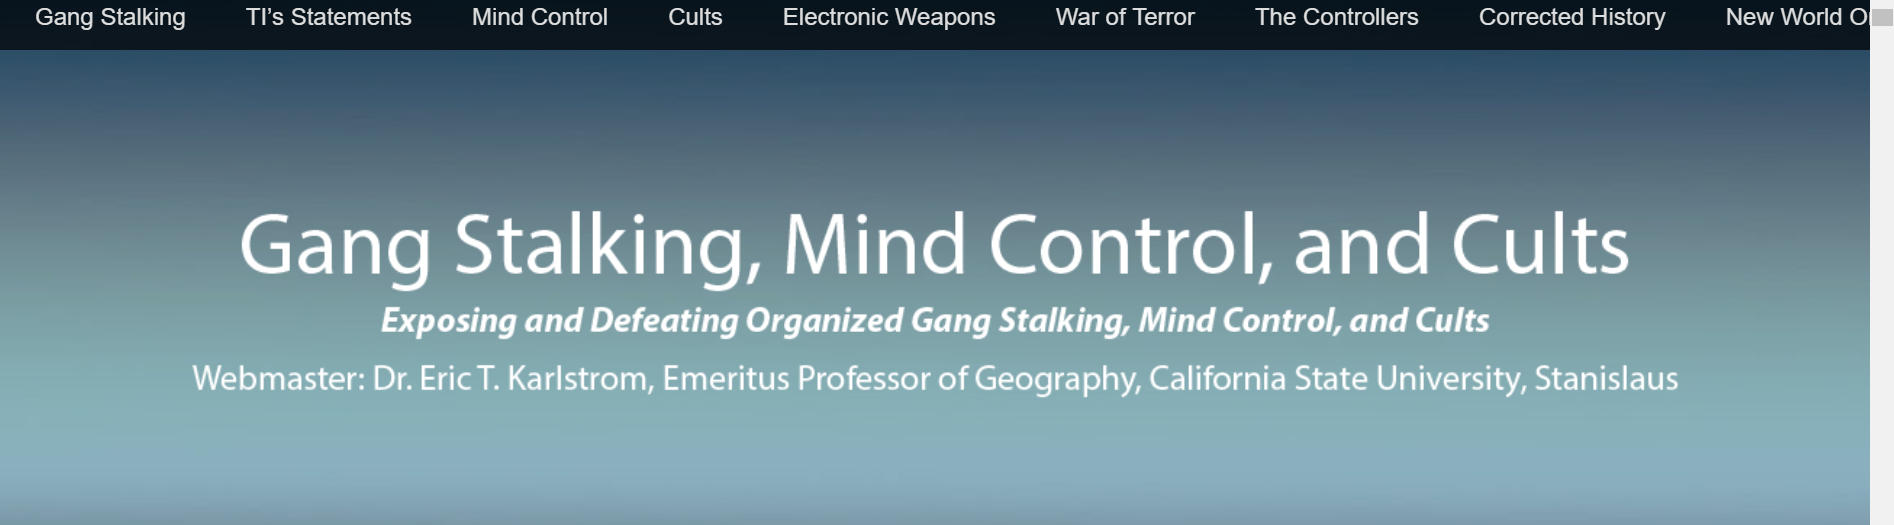 gangstalking | The EveryDay Concerned Citizen